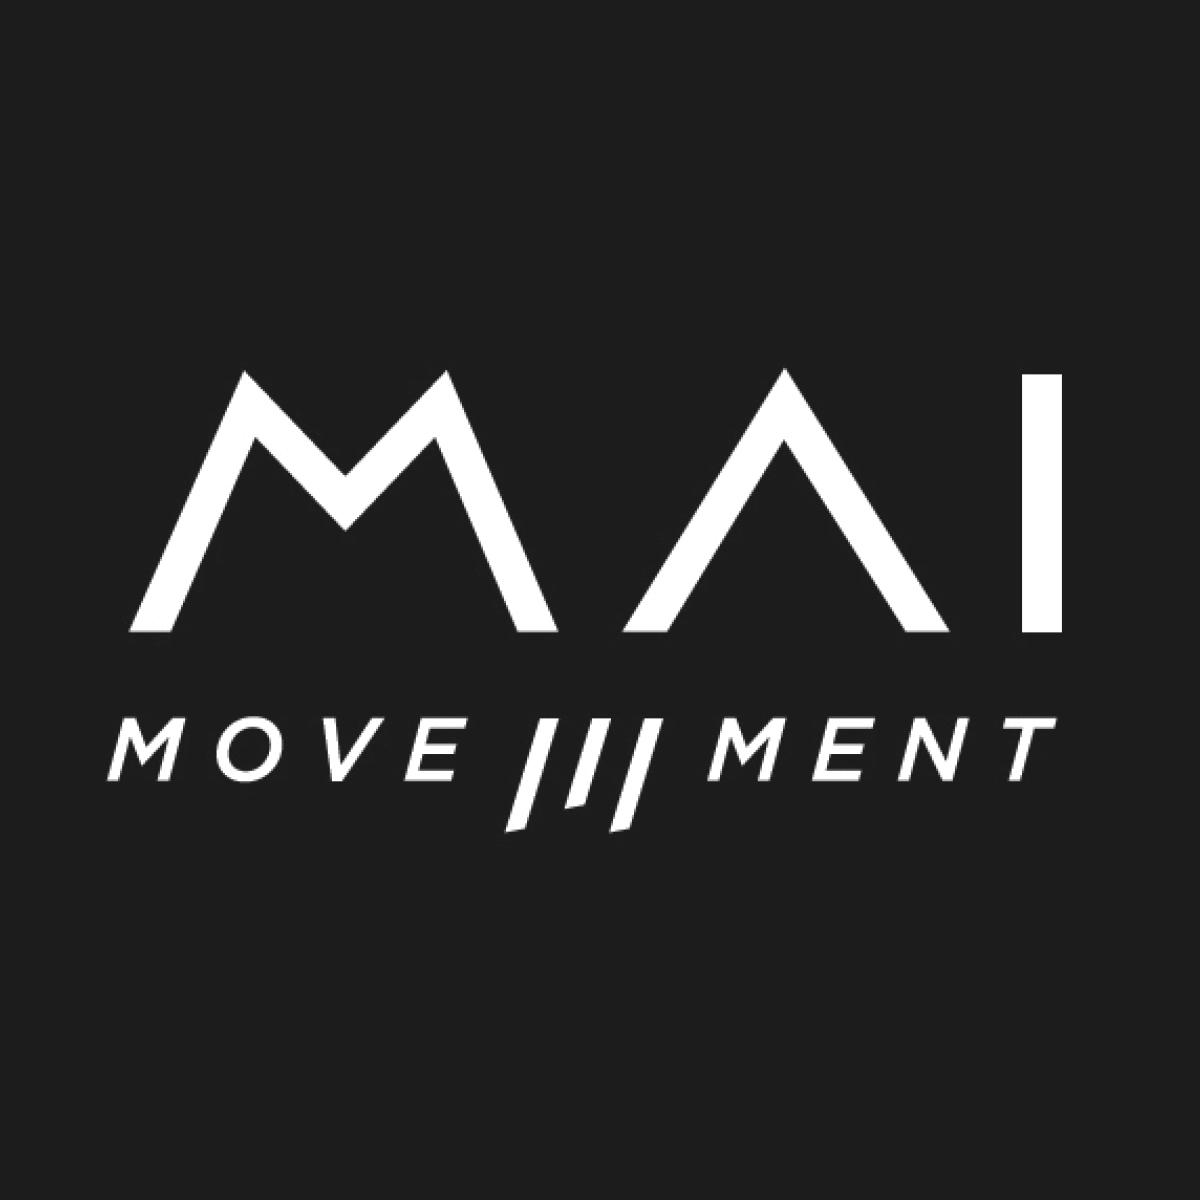 MAI MOVEMENT_new logo.jpg